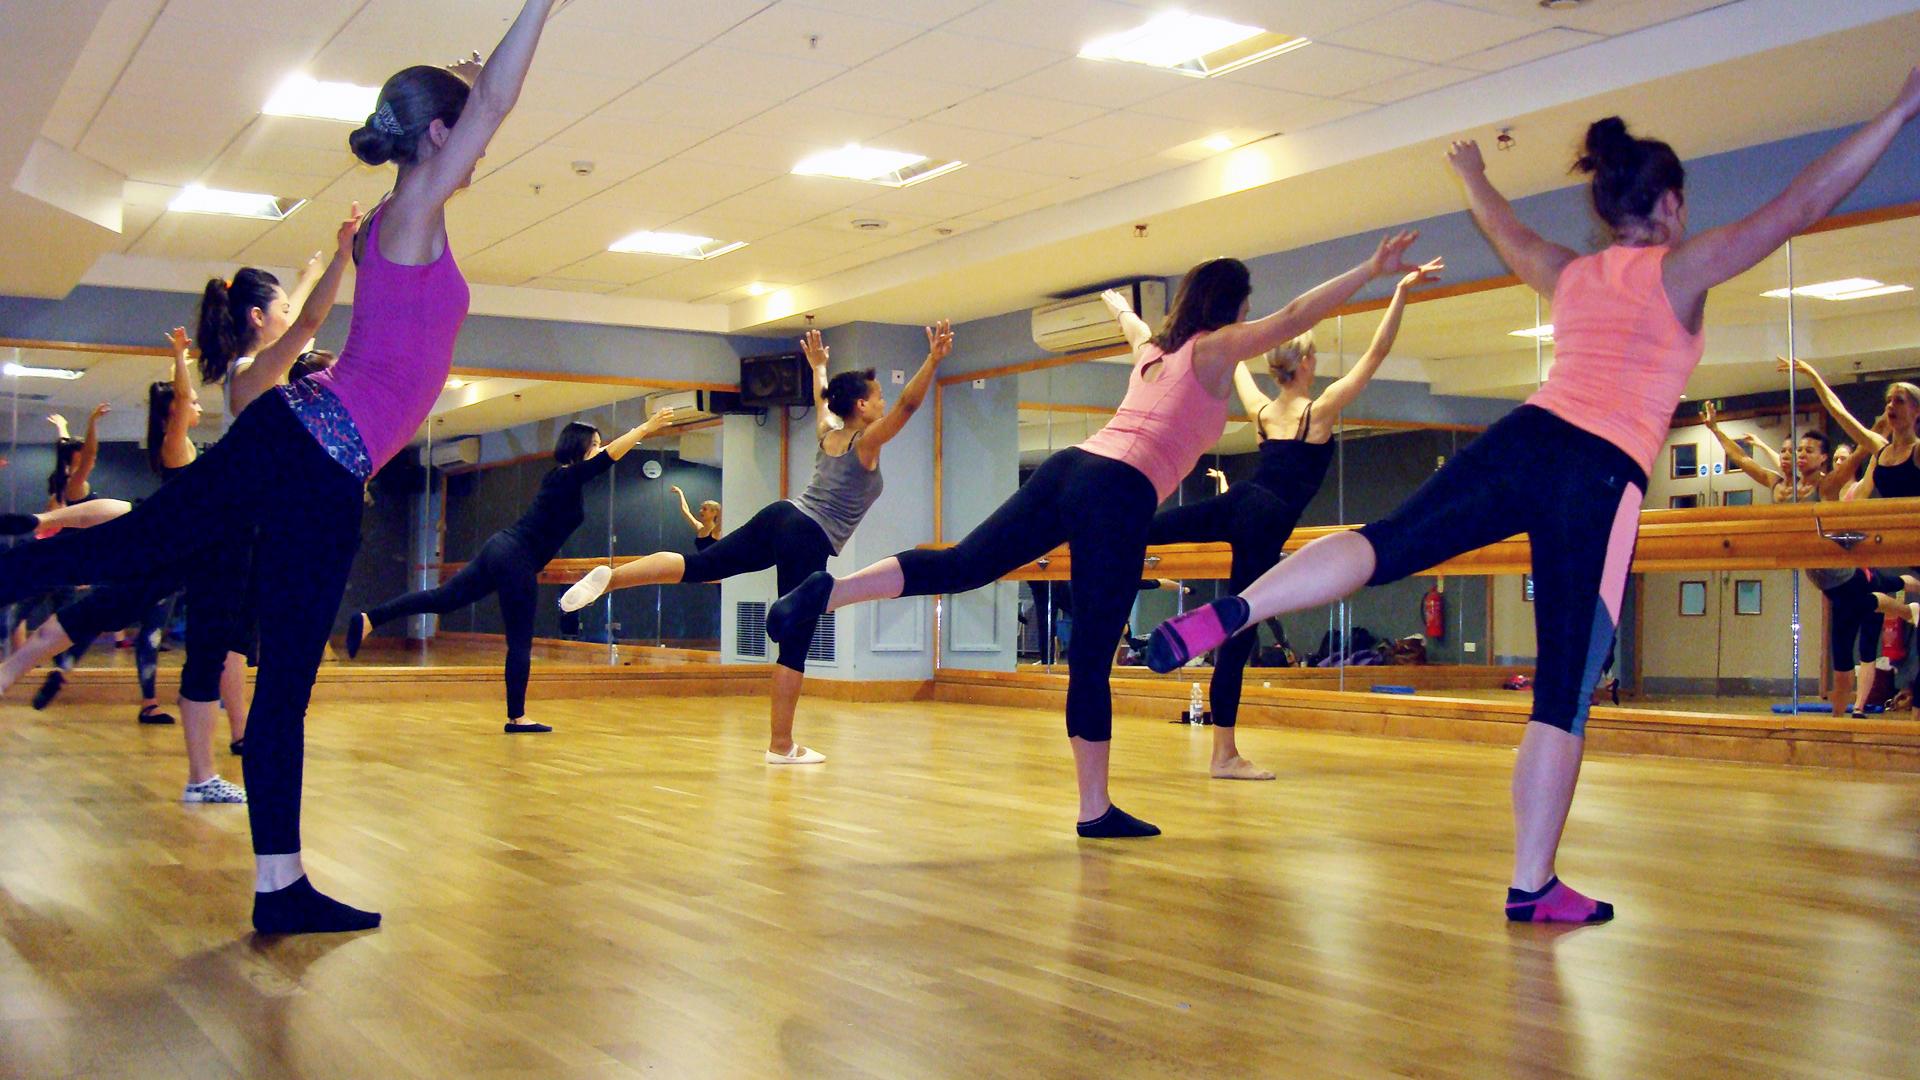 Copy of ballet body sculpture classes